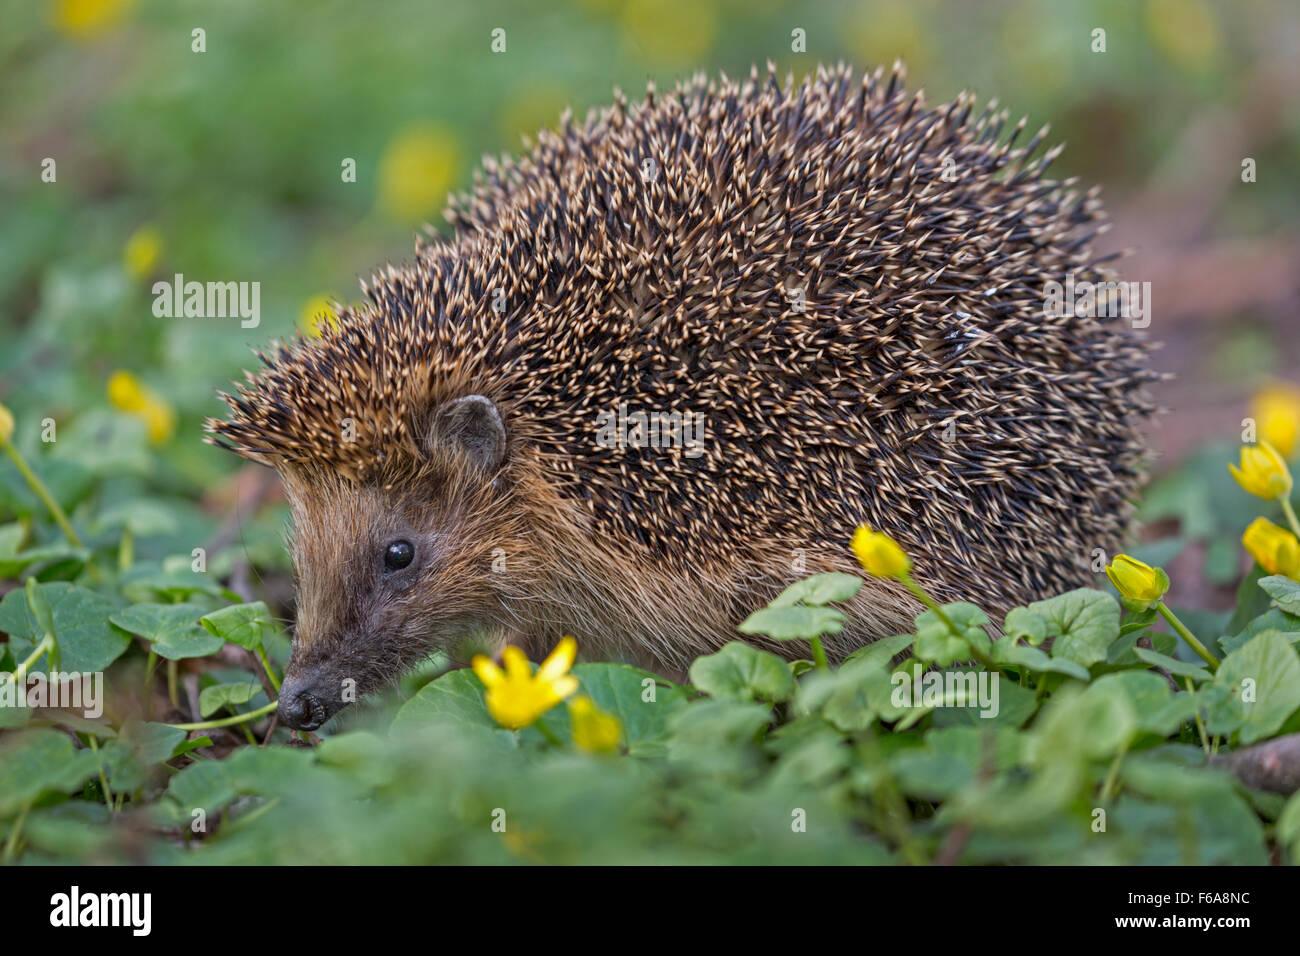 Common hedgehog, Schleswig Holstein, Germany, Europe / Erinaceus europaeus - Stock Image